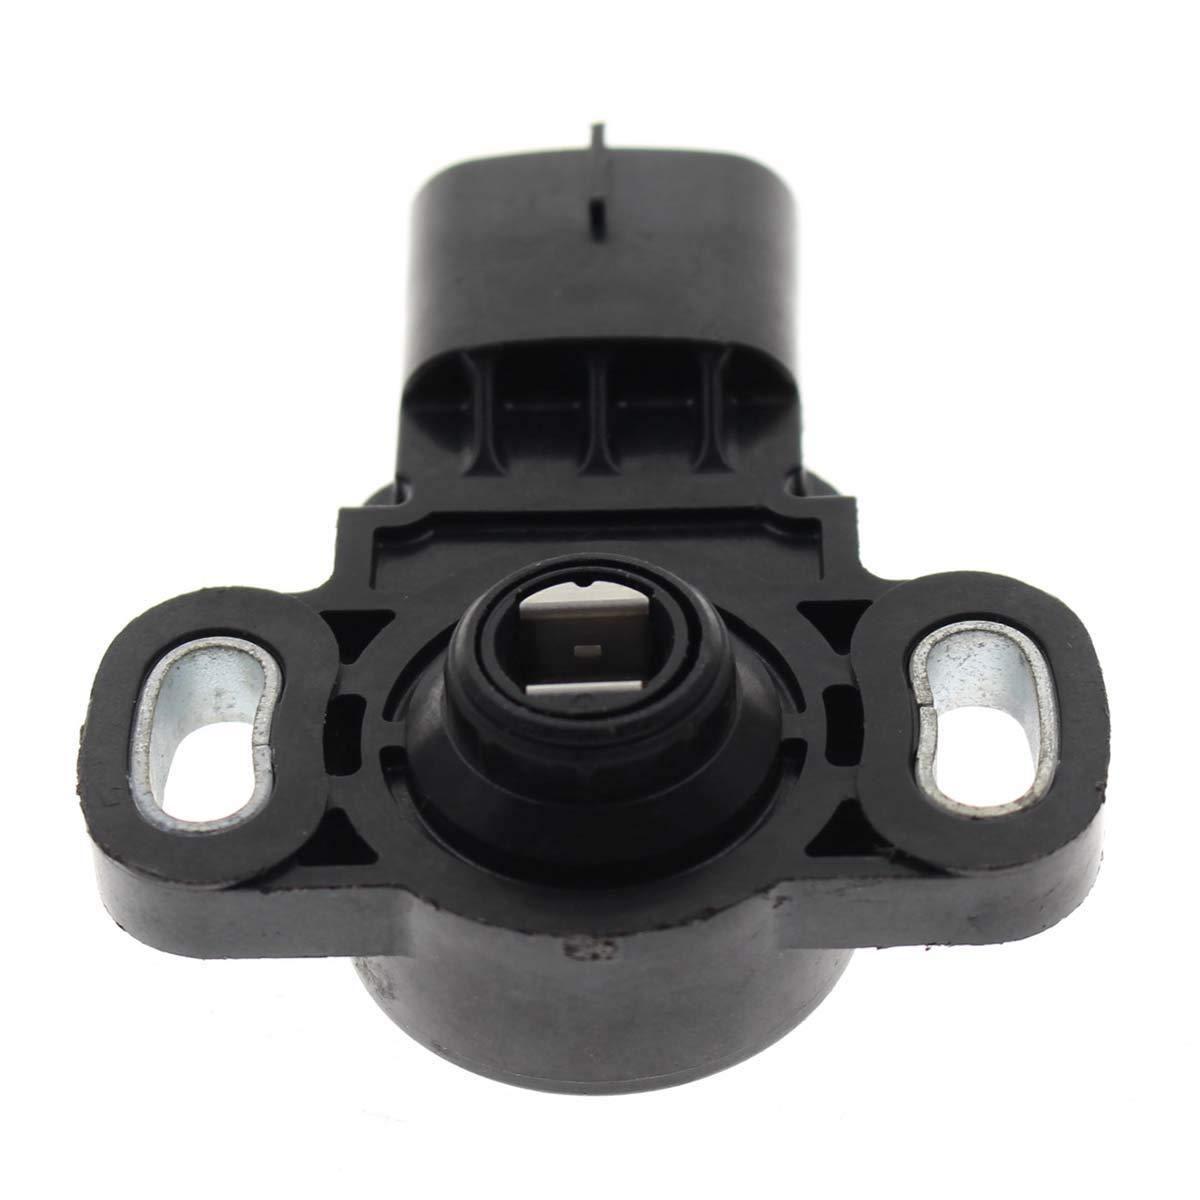 AUTOKAY New Throttle Position Sensor for Yamaha Grizzly Rhino YFZ450R 3B4-85885-00-00